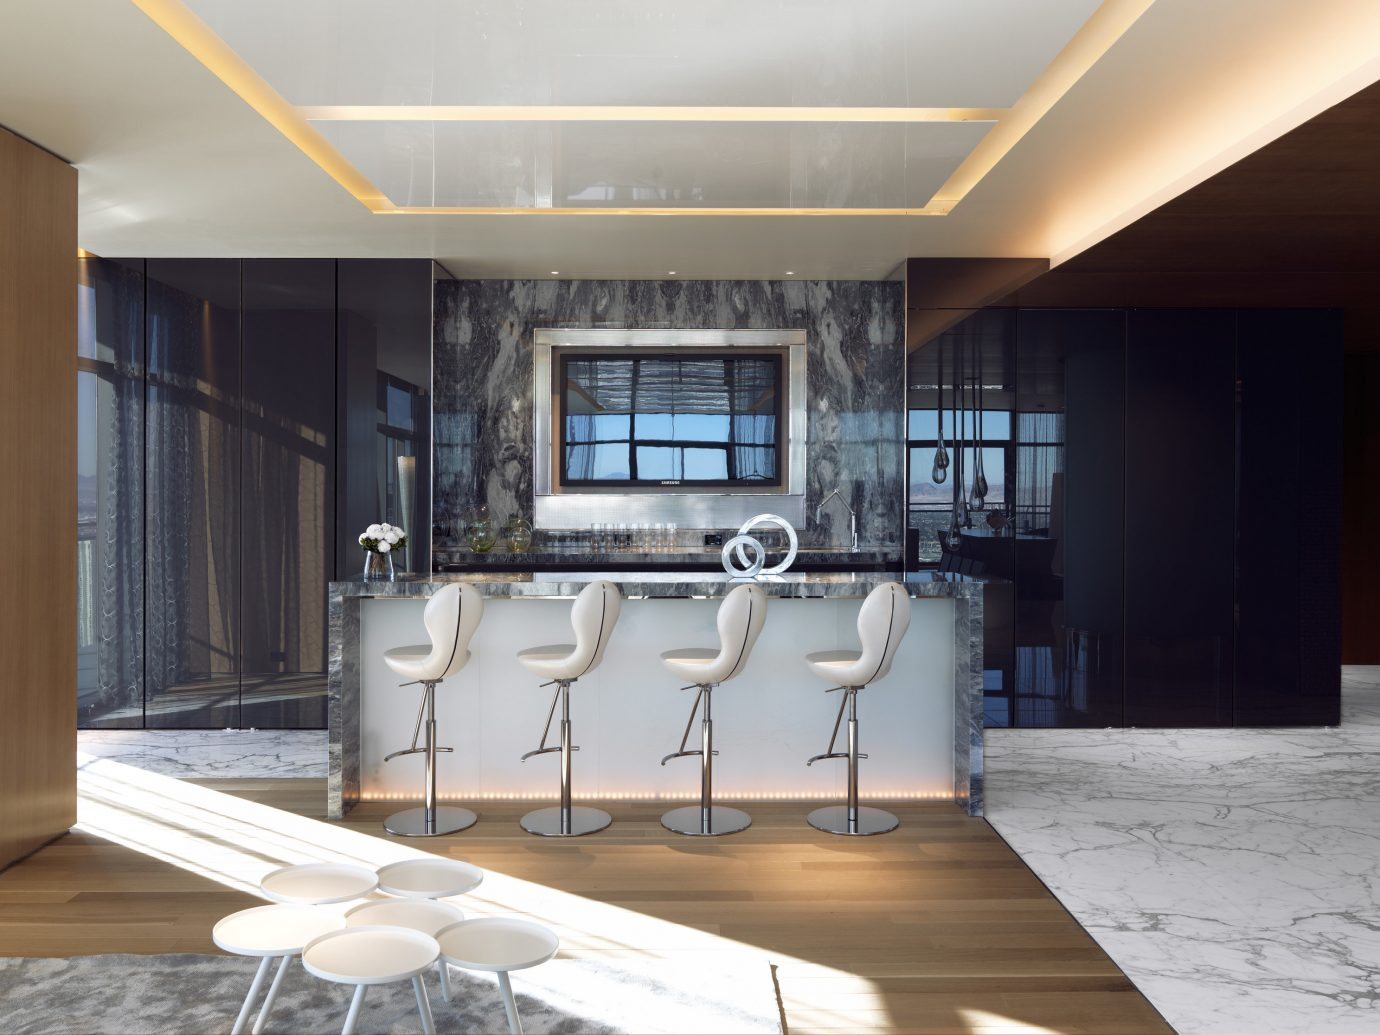 Private bar in the Bentel & Bentel Penthouse Suites, The Cosmopolitan of Las Vegas